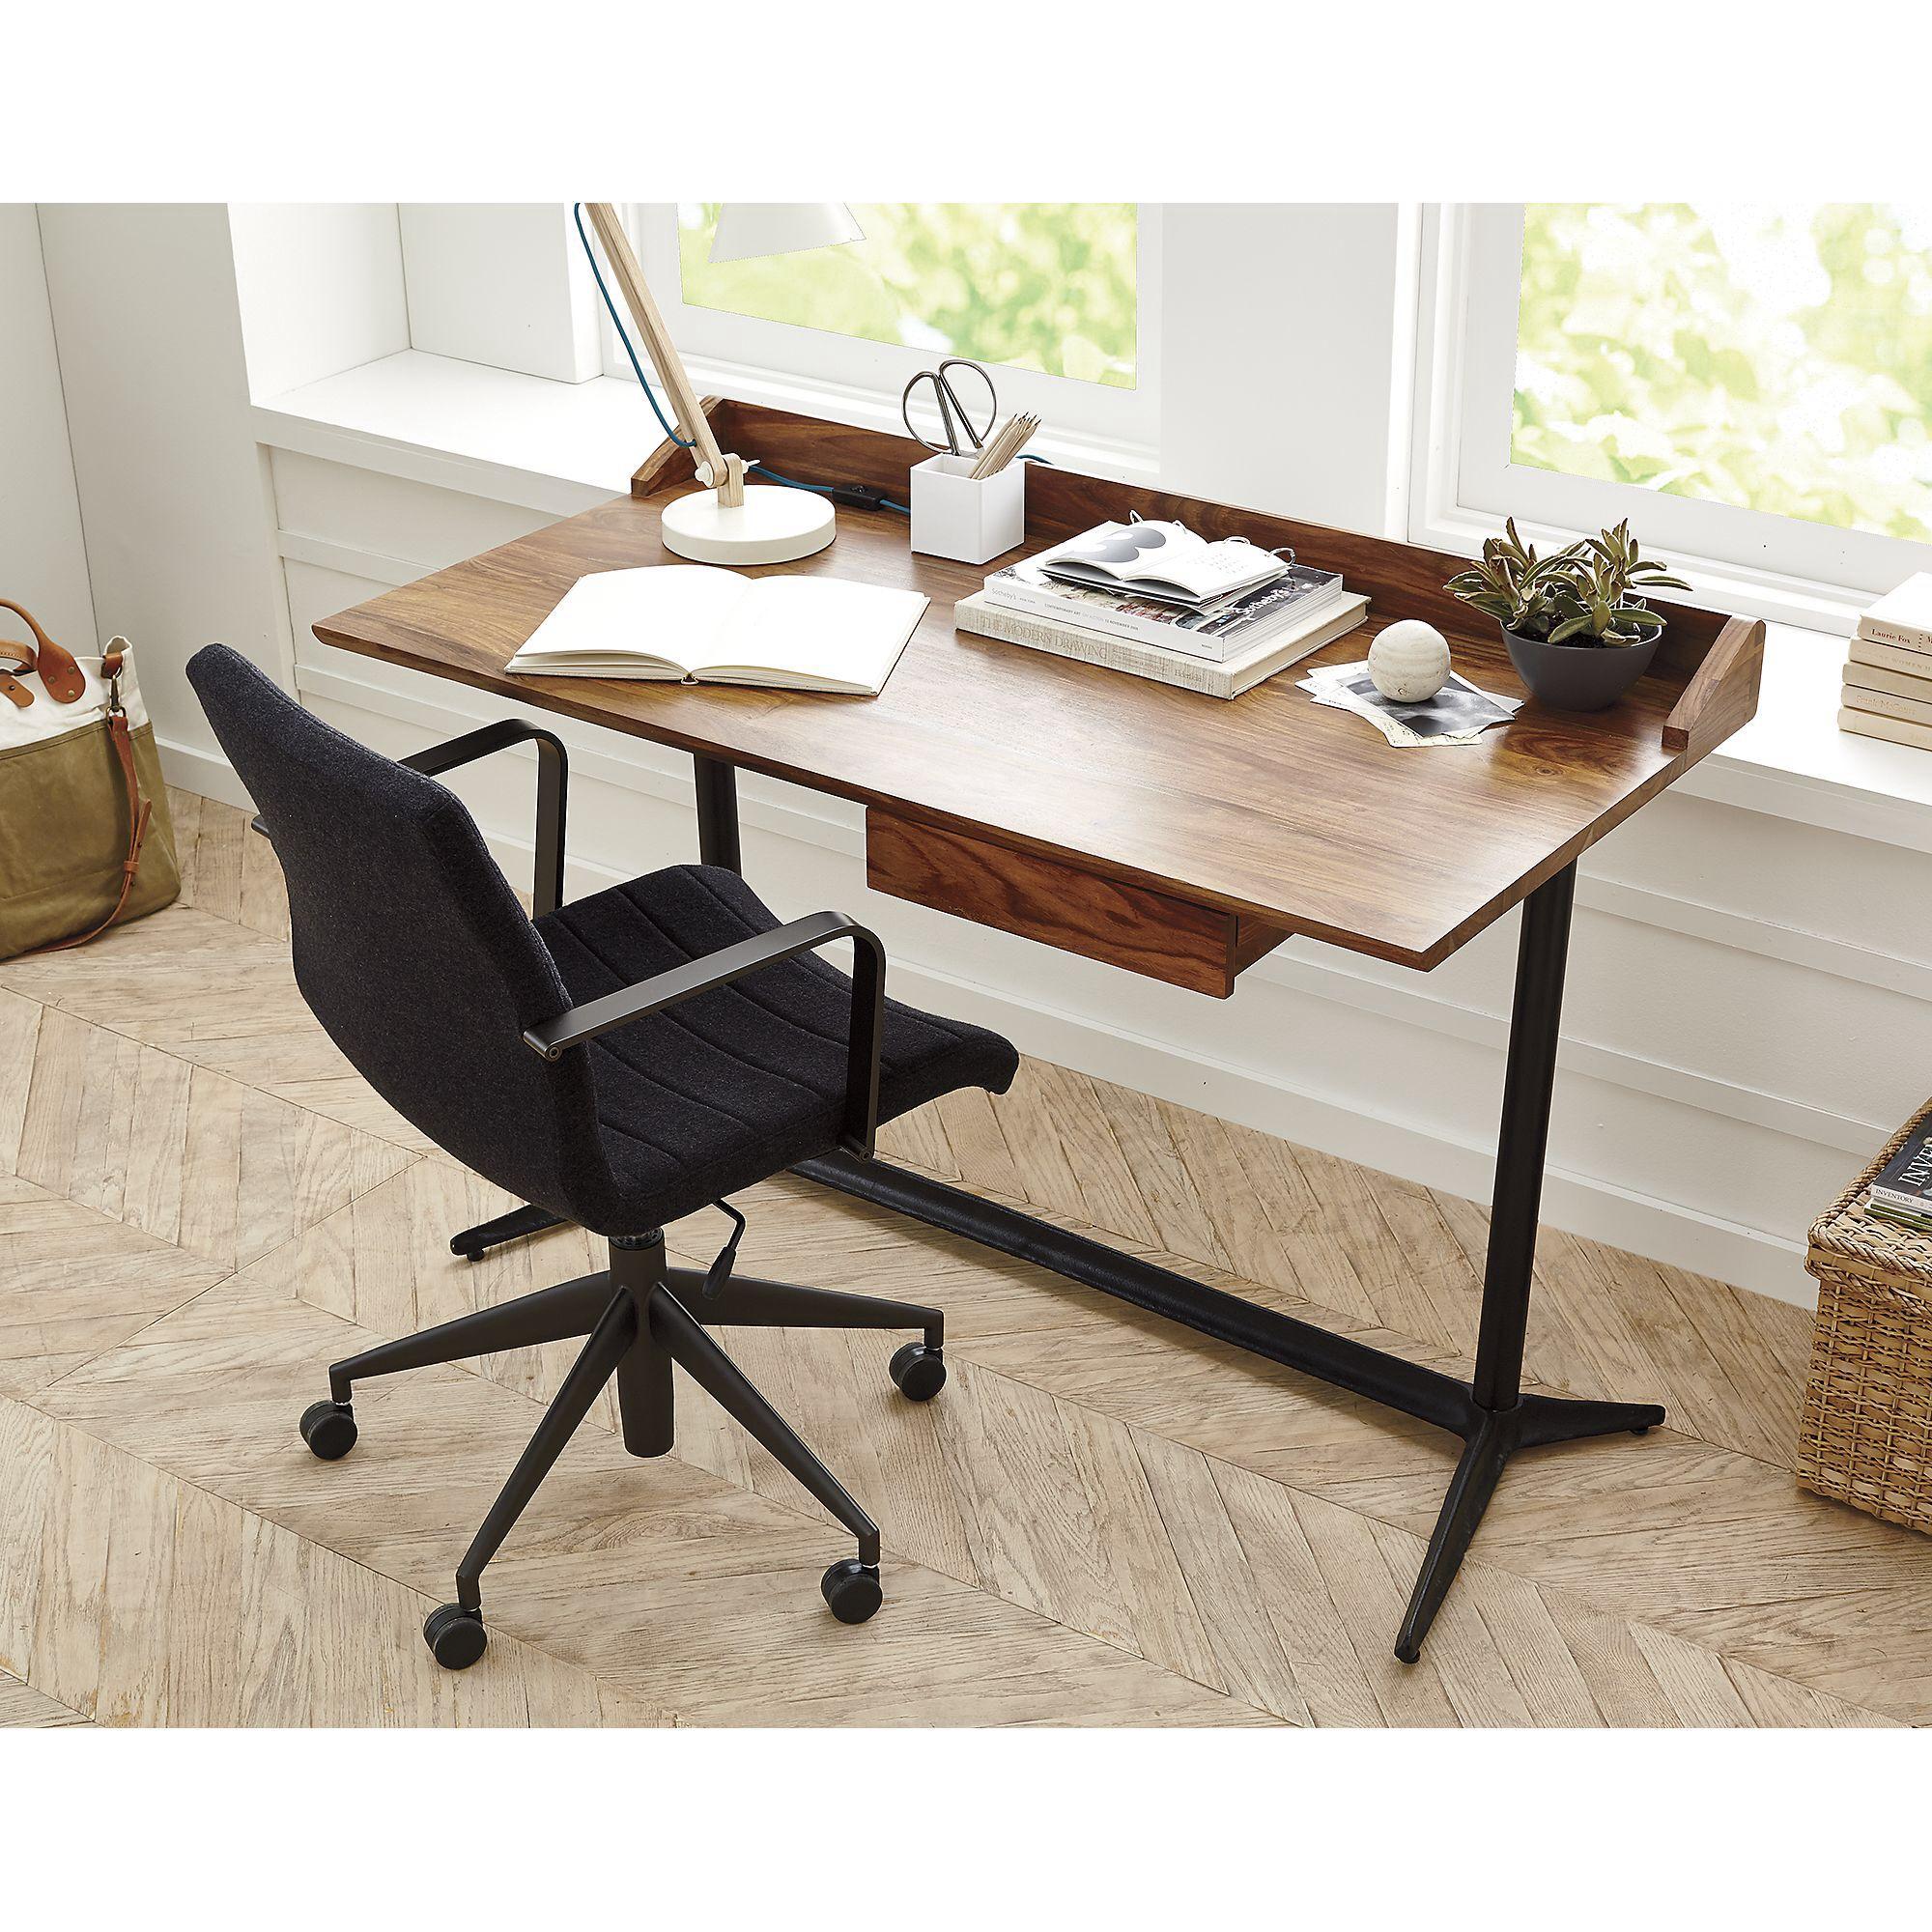 Spence Desk Crate & Barrell Home fice